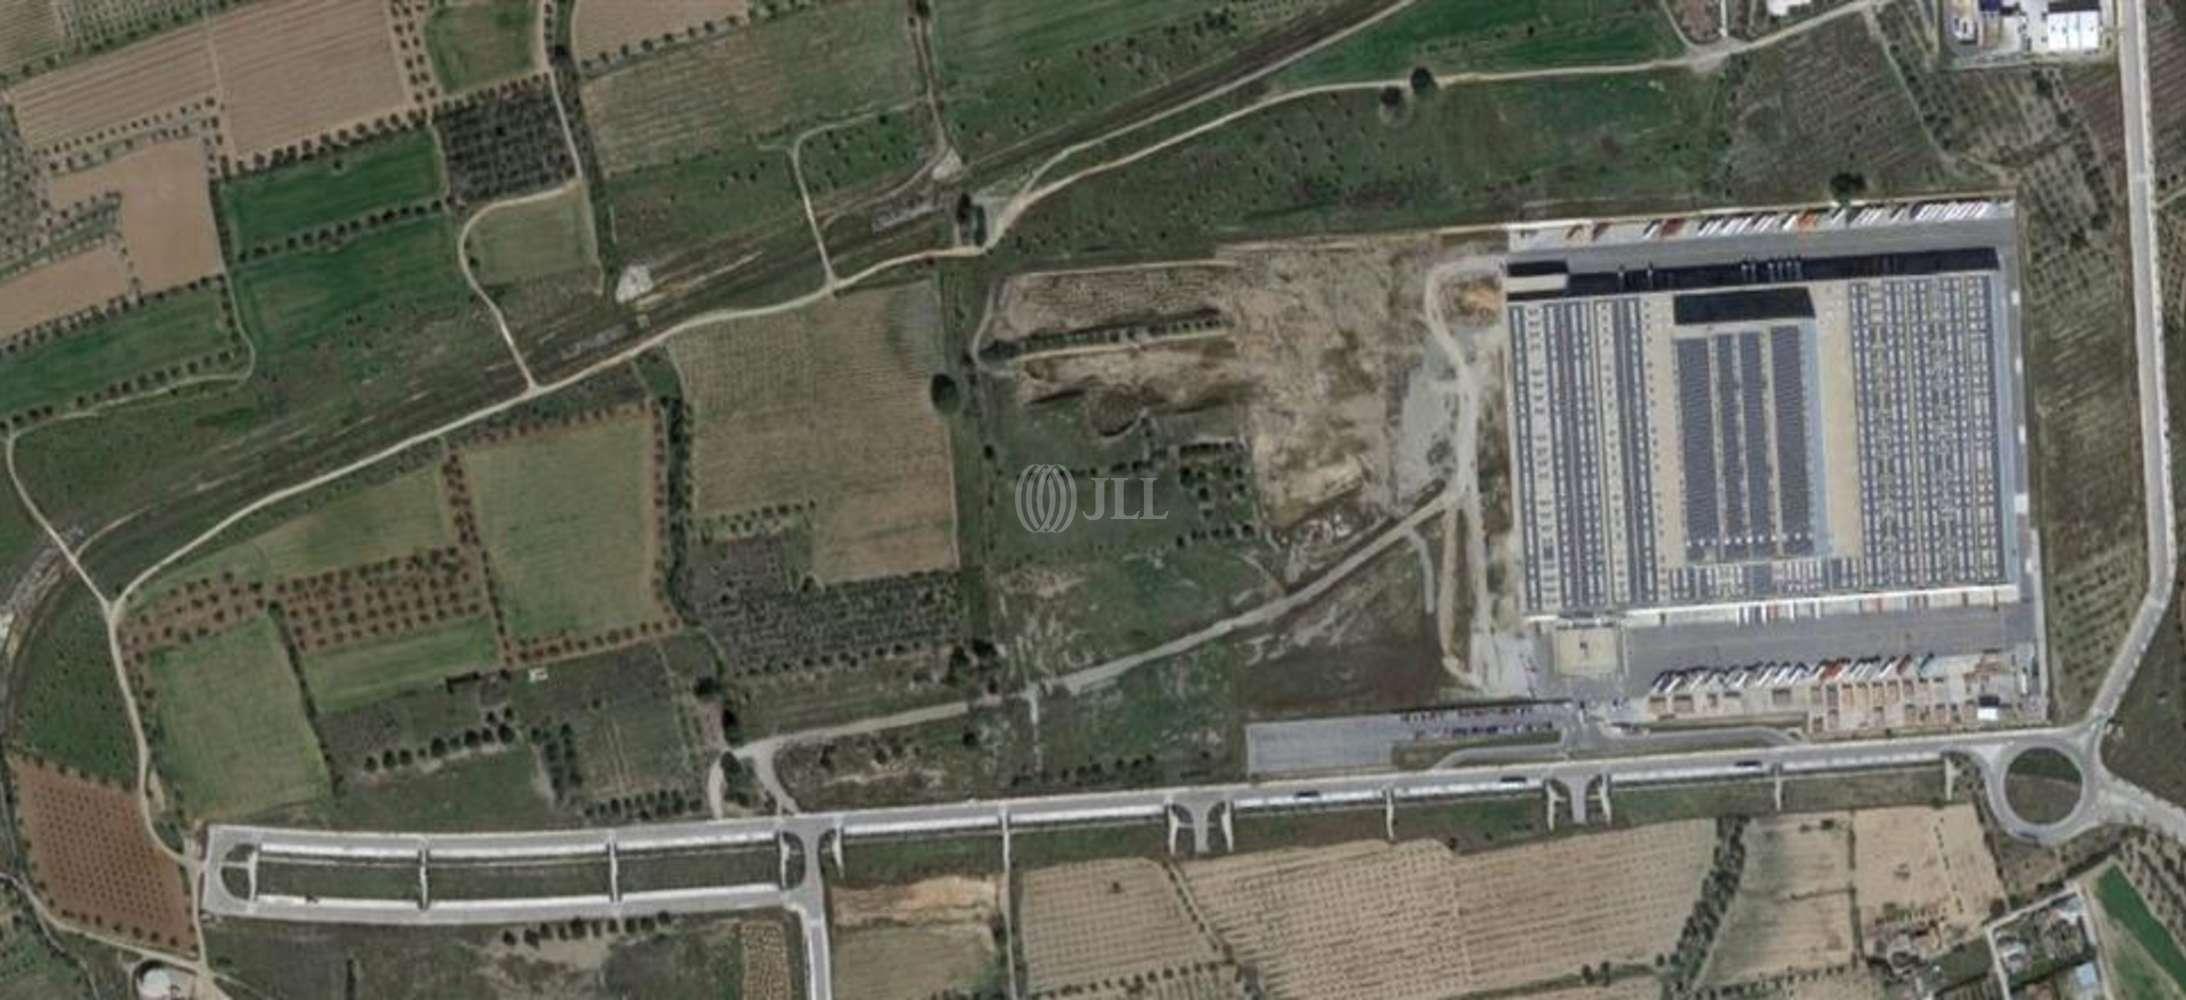 Naves industriales y logísticas Valls, 43800 - Nave Logistica - B0436 - PI VALLS - 10507